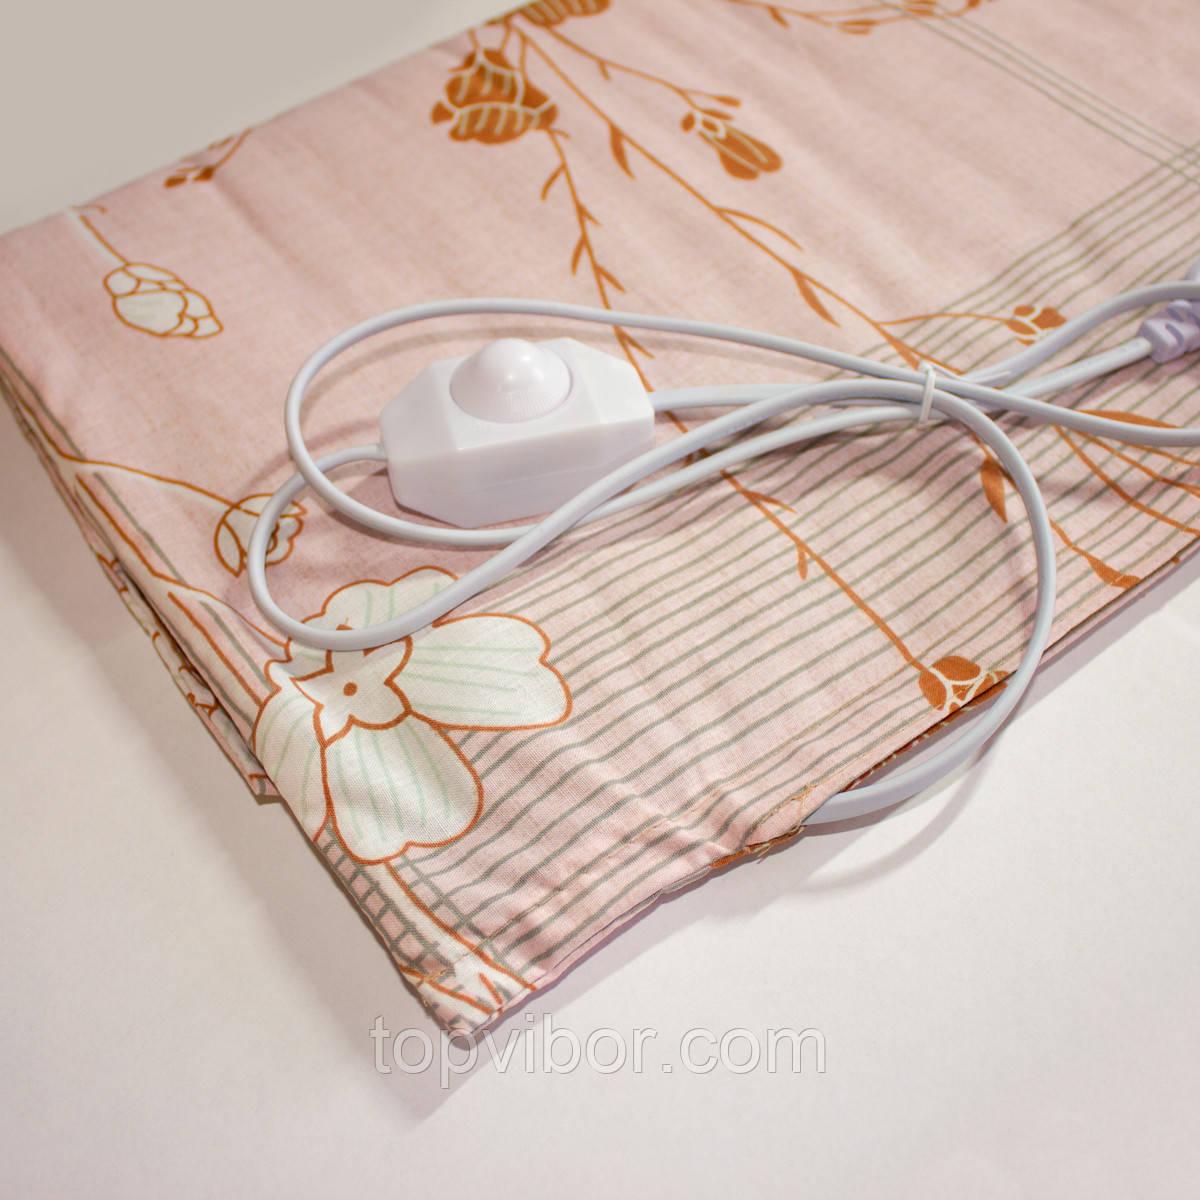 Электрогрелка Чудесник Розовая 40W с регулятором температуры 40х50 см | електрична грілка (VT)